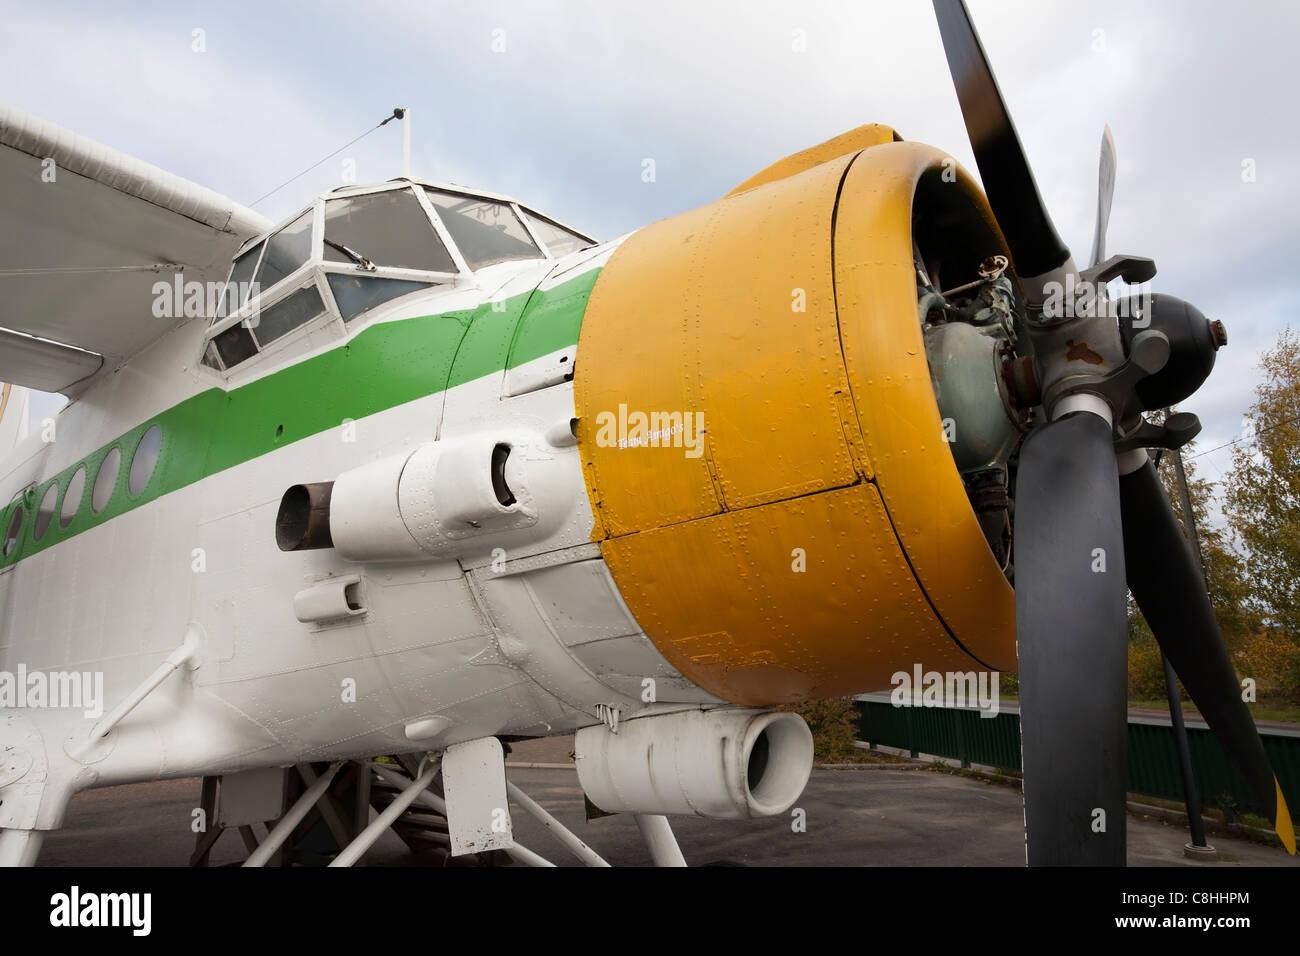 Antonov An-2 airplane on display in Utti Kouvola Finland - Stock Image